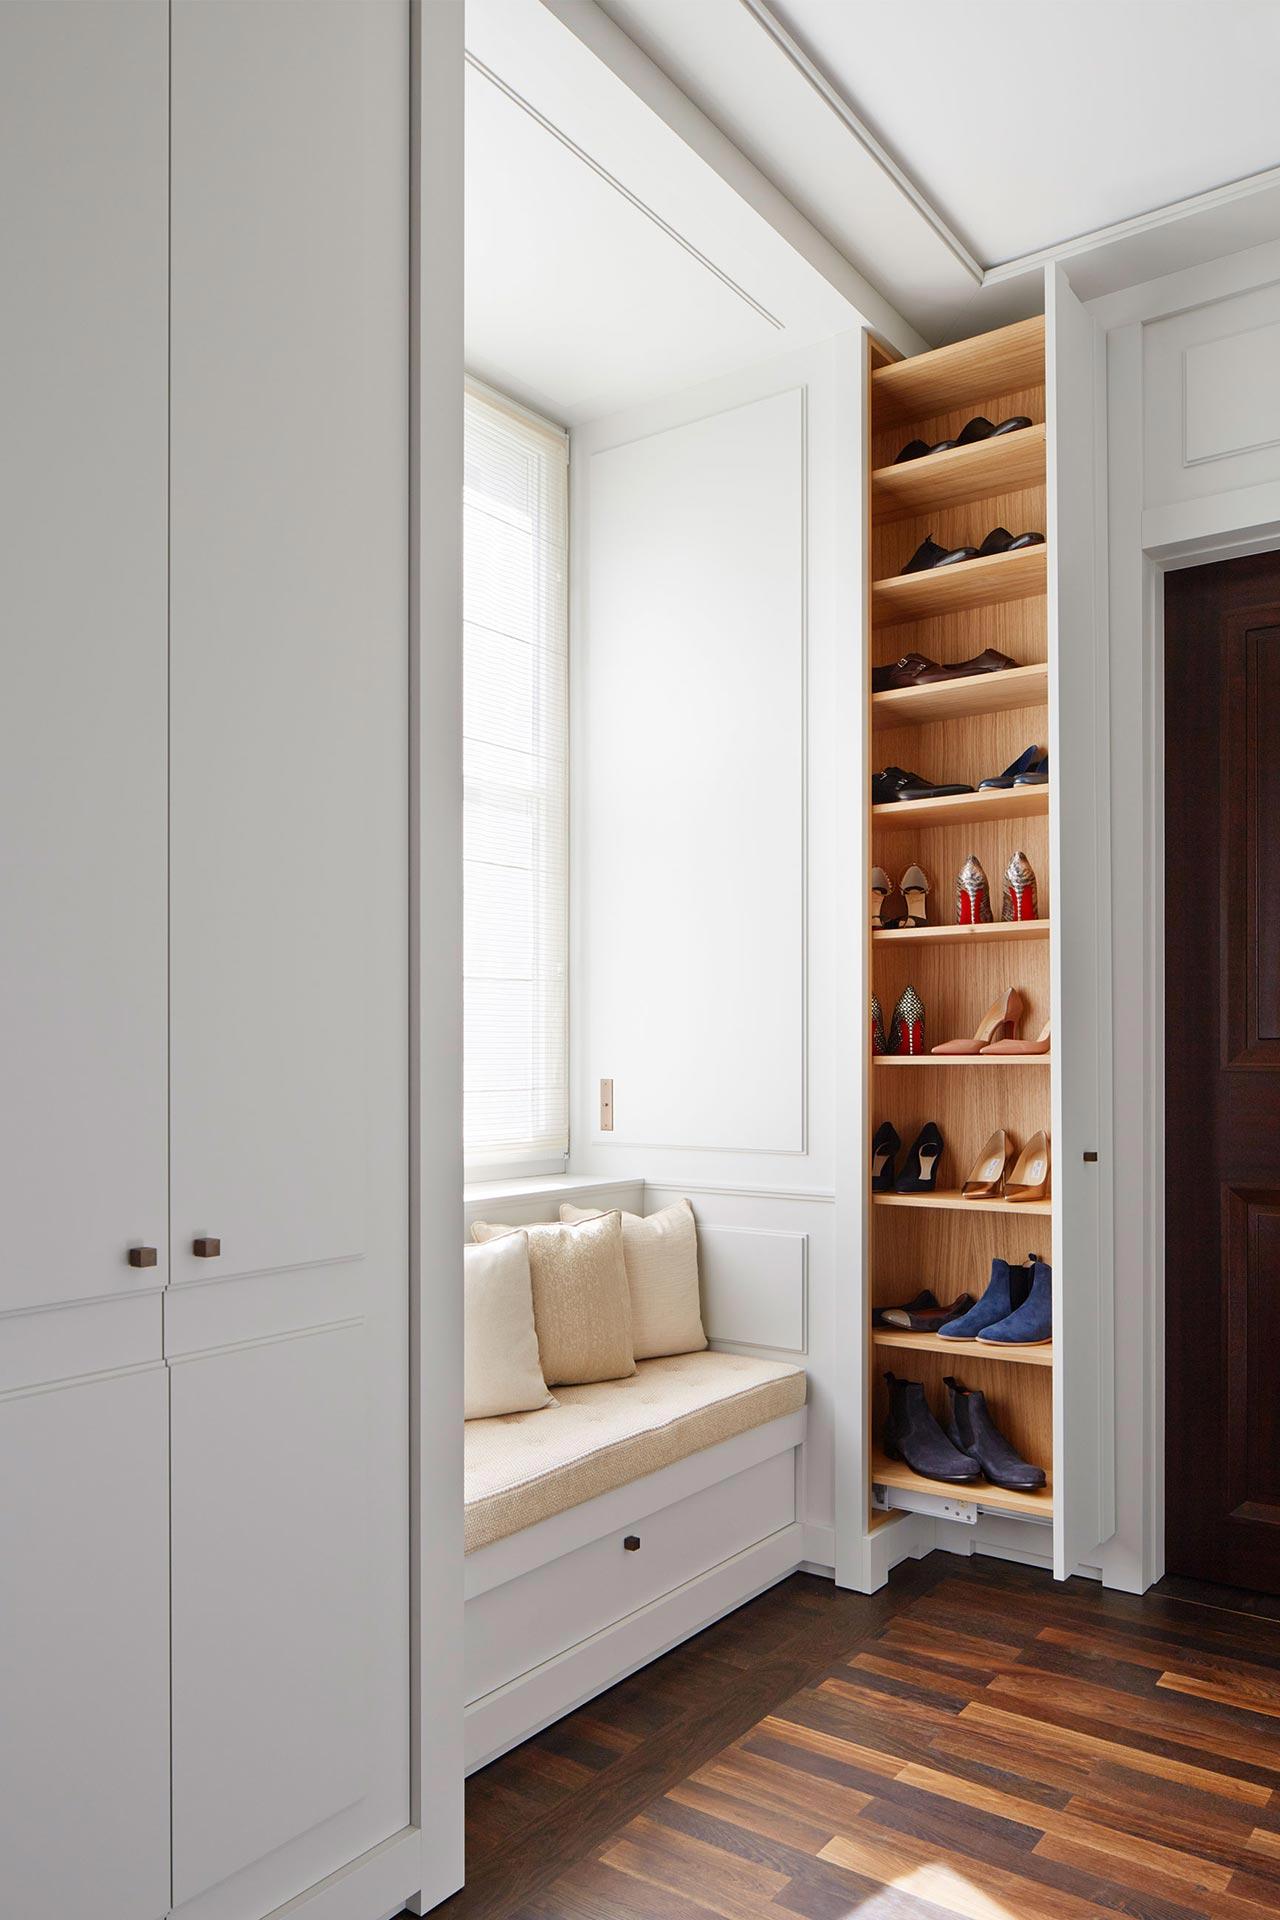 Interior fitted wardrobe